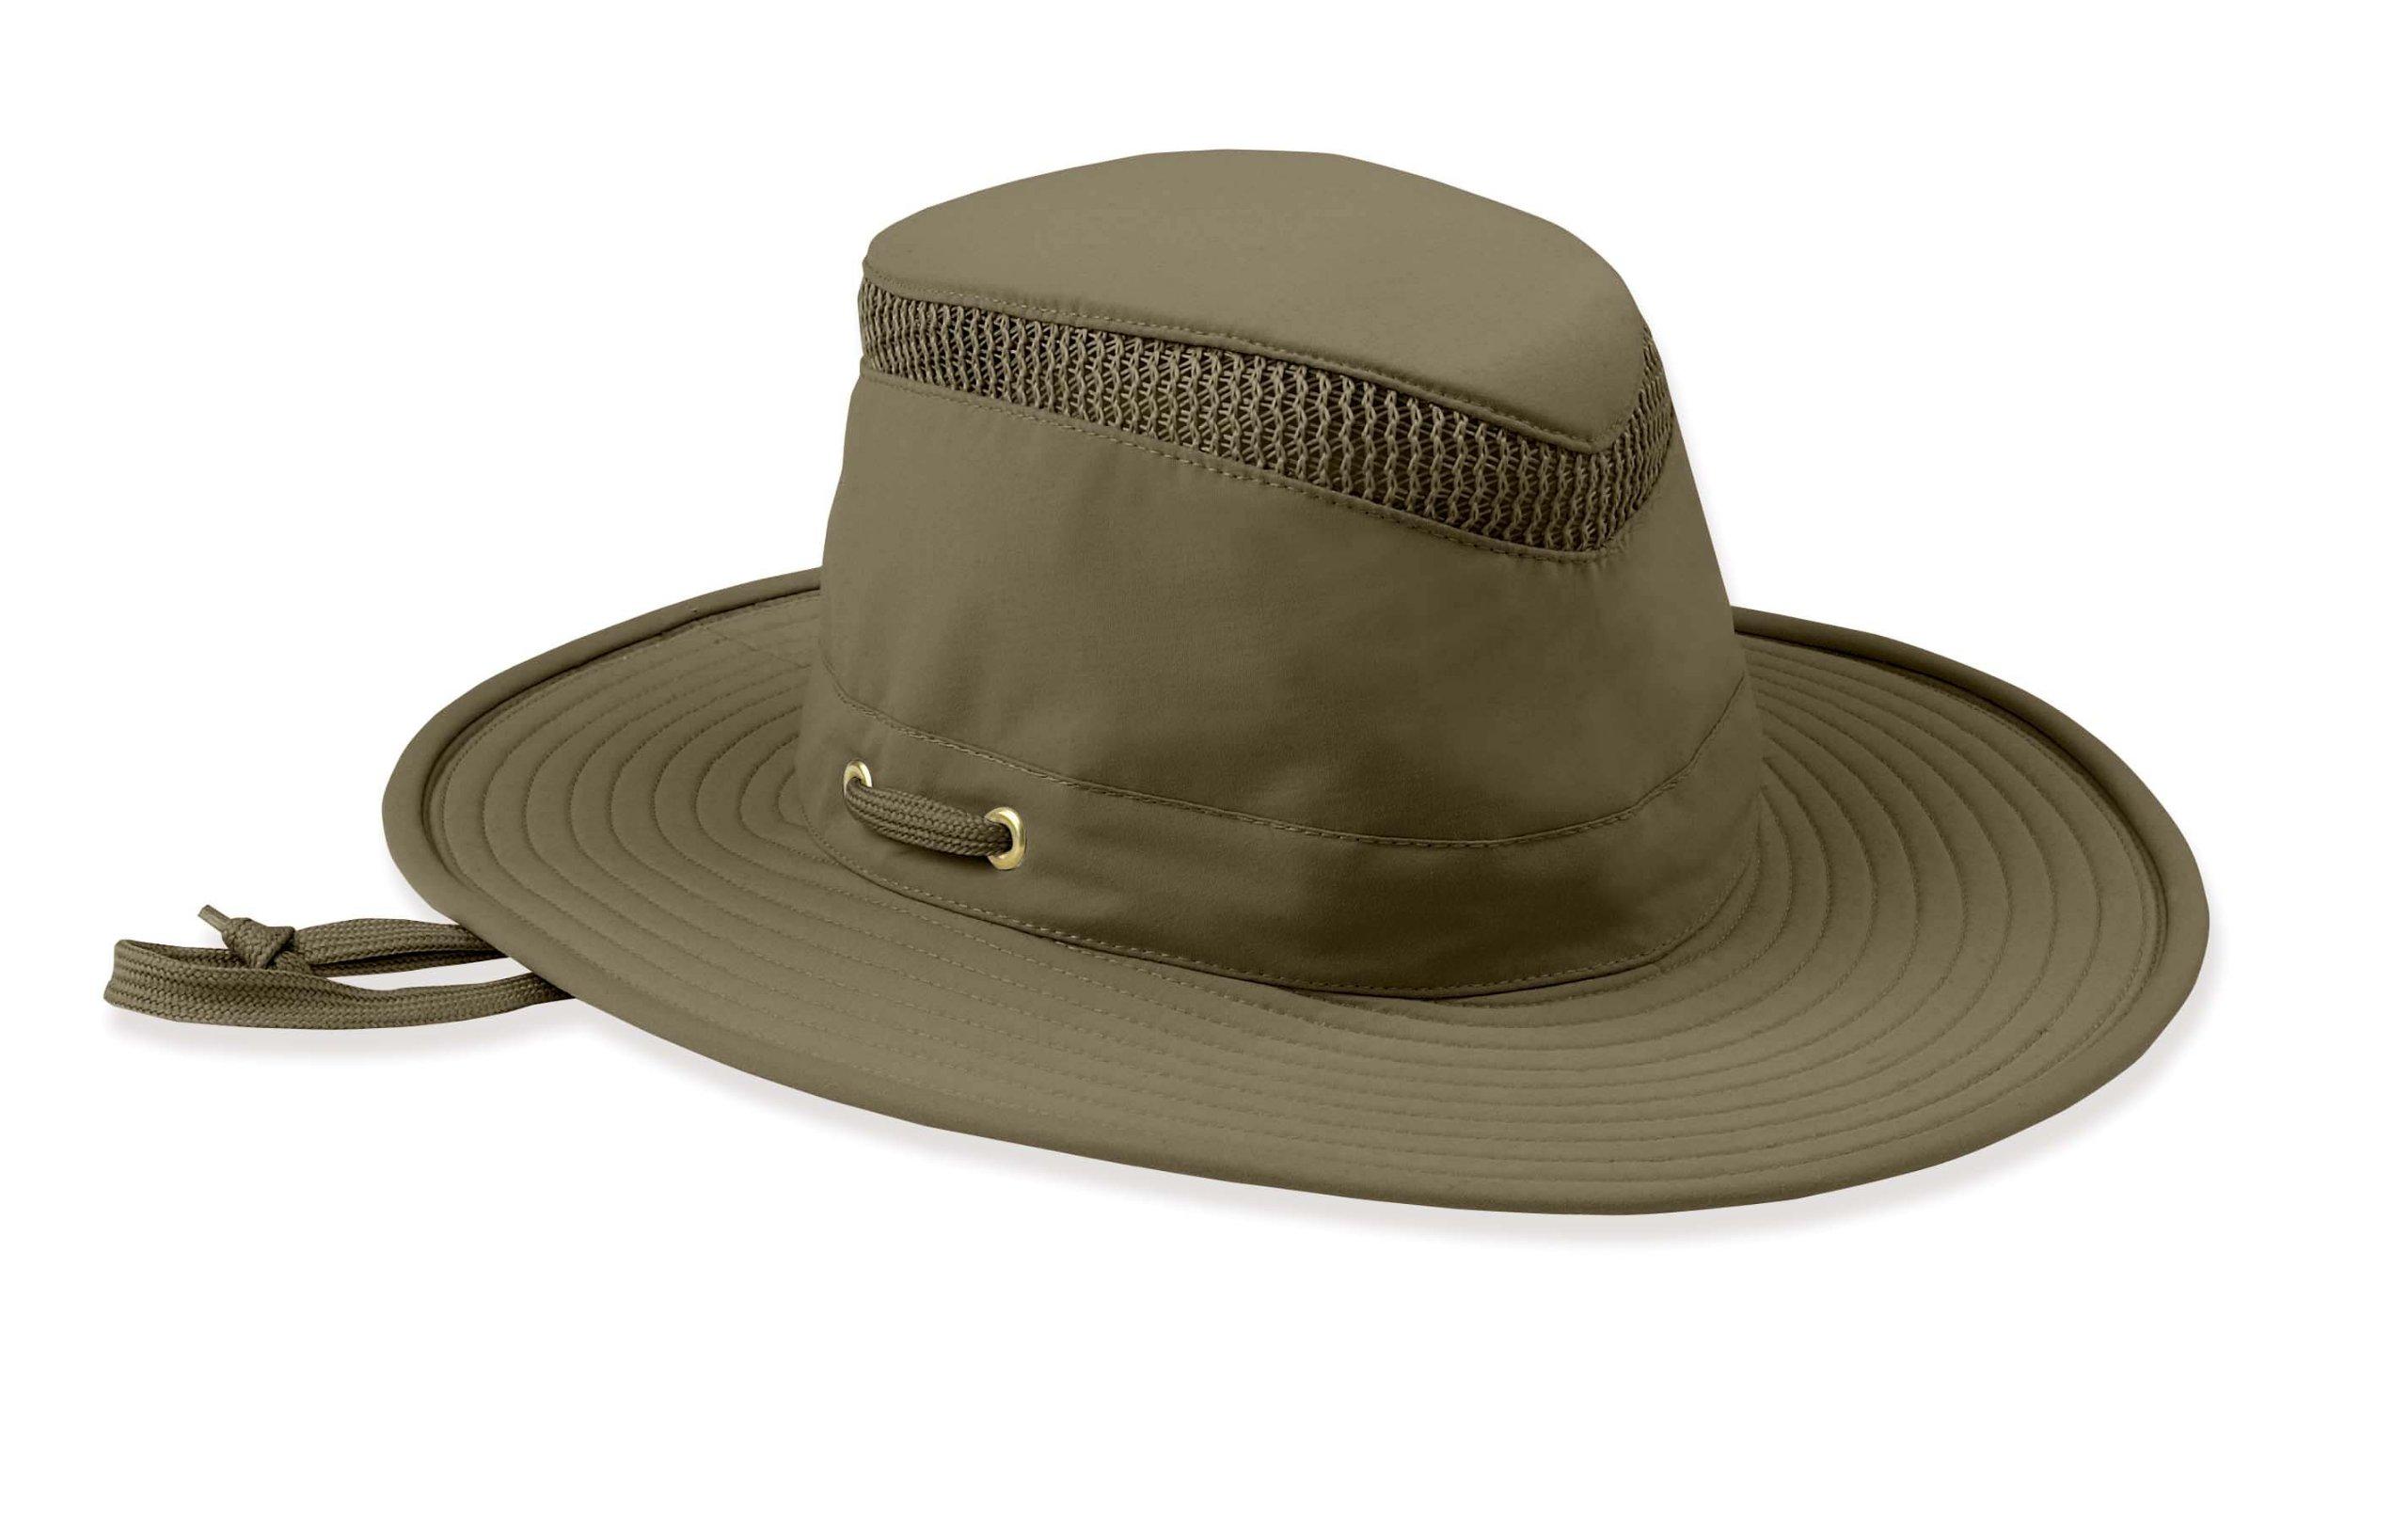 Tilley Endurables LTM6 Airflo Hat,Olive,7 7/8